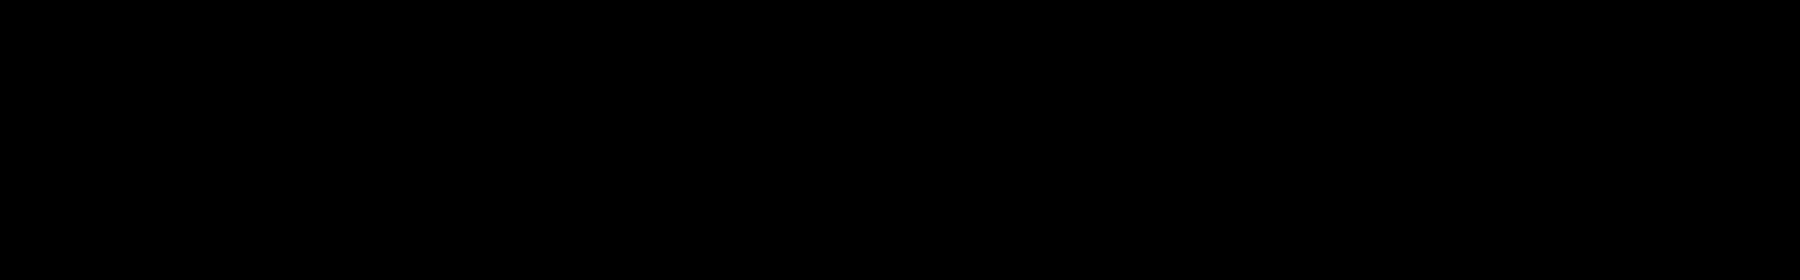 Ryan Konline: House Acapellas audio waveform